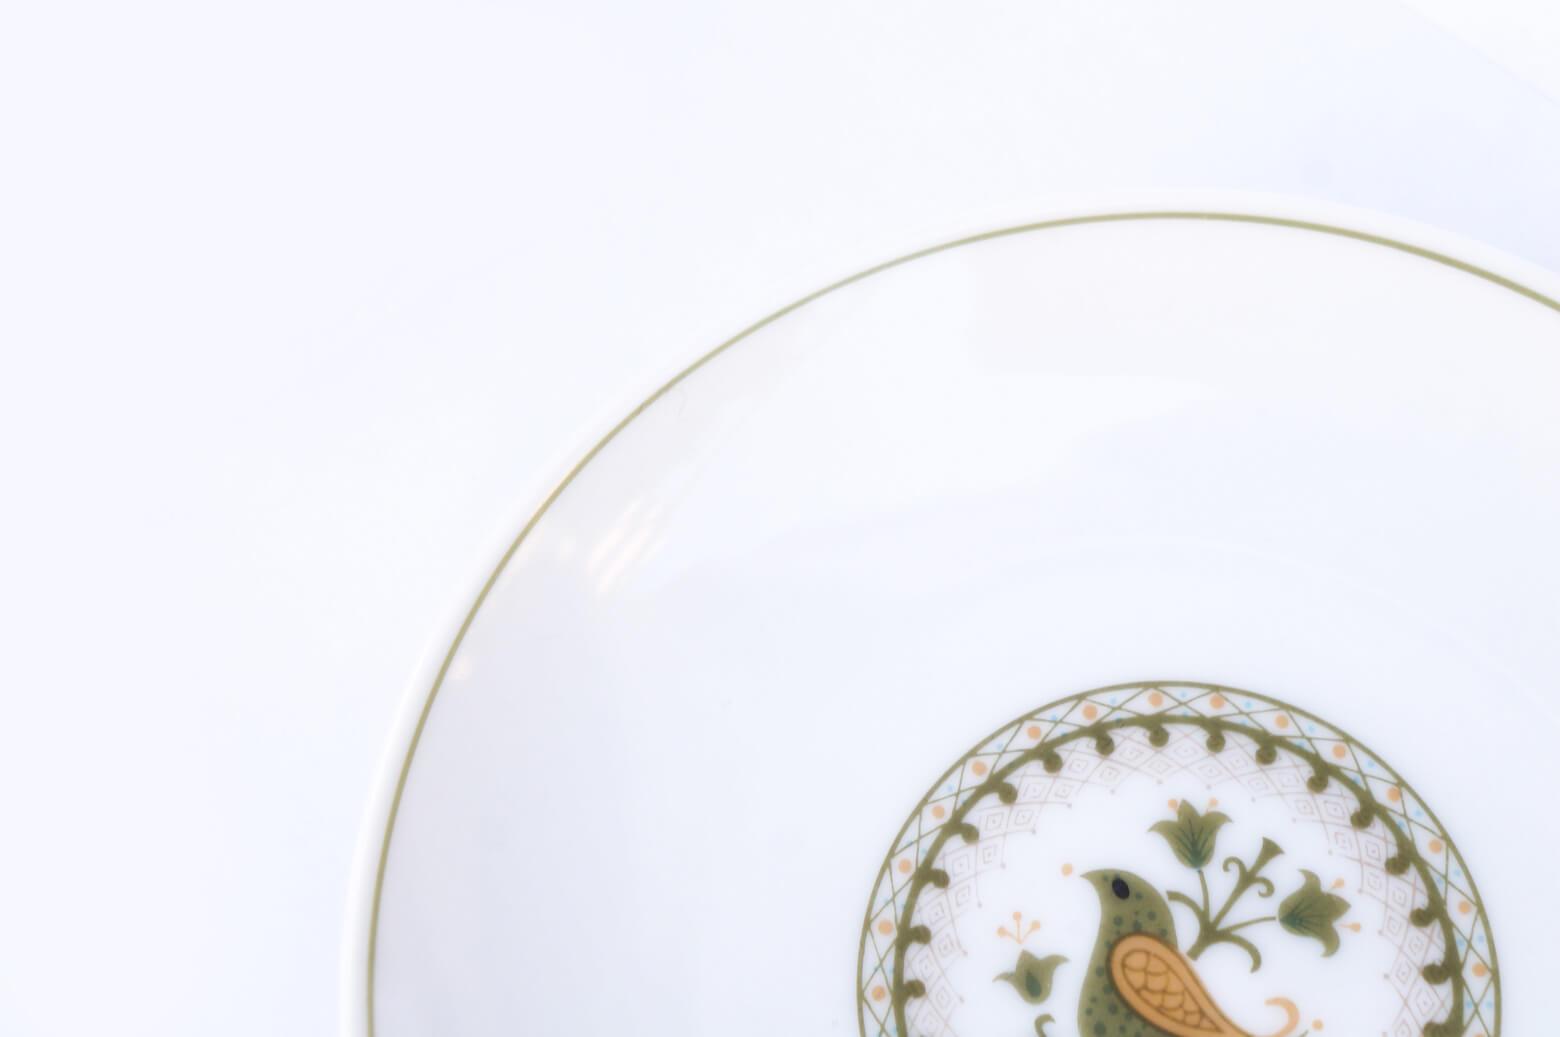 Vintage Noritake Cake Plate Hermitage U.S. Pattern Tableware/ノリタケ ケーキ プレート エルミタージュ テーブルウェア レトロ ヴィンテージ食器 3